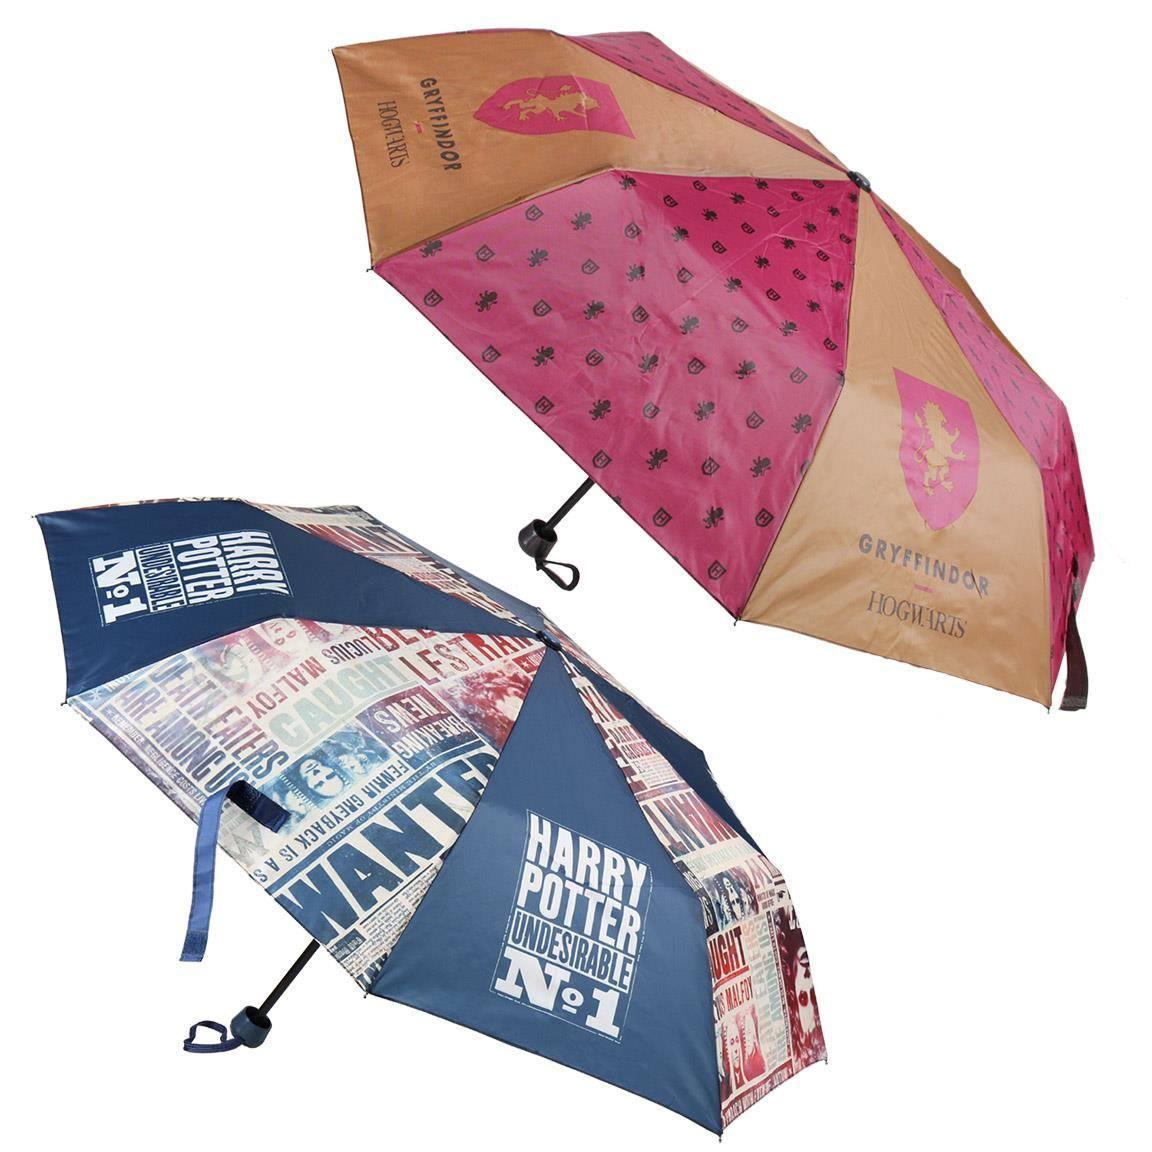 Harry Potter Umbrella Case (4)